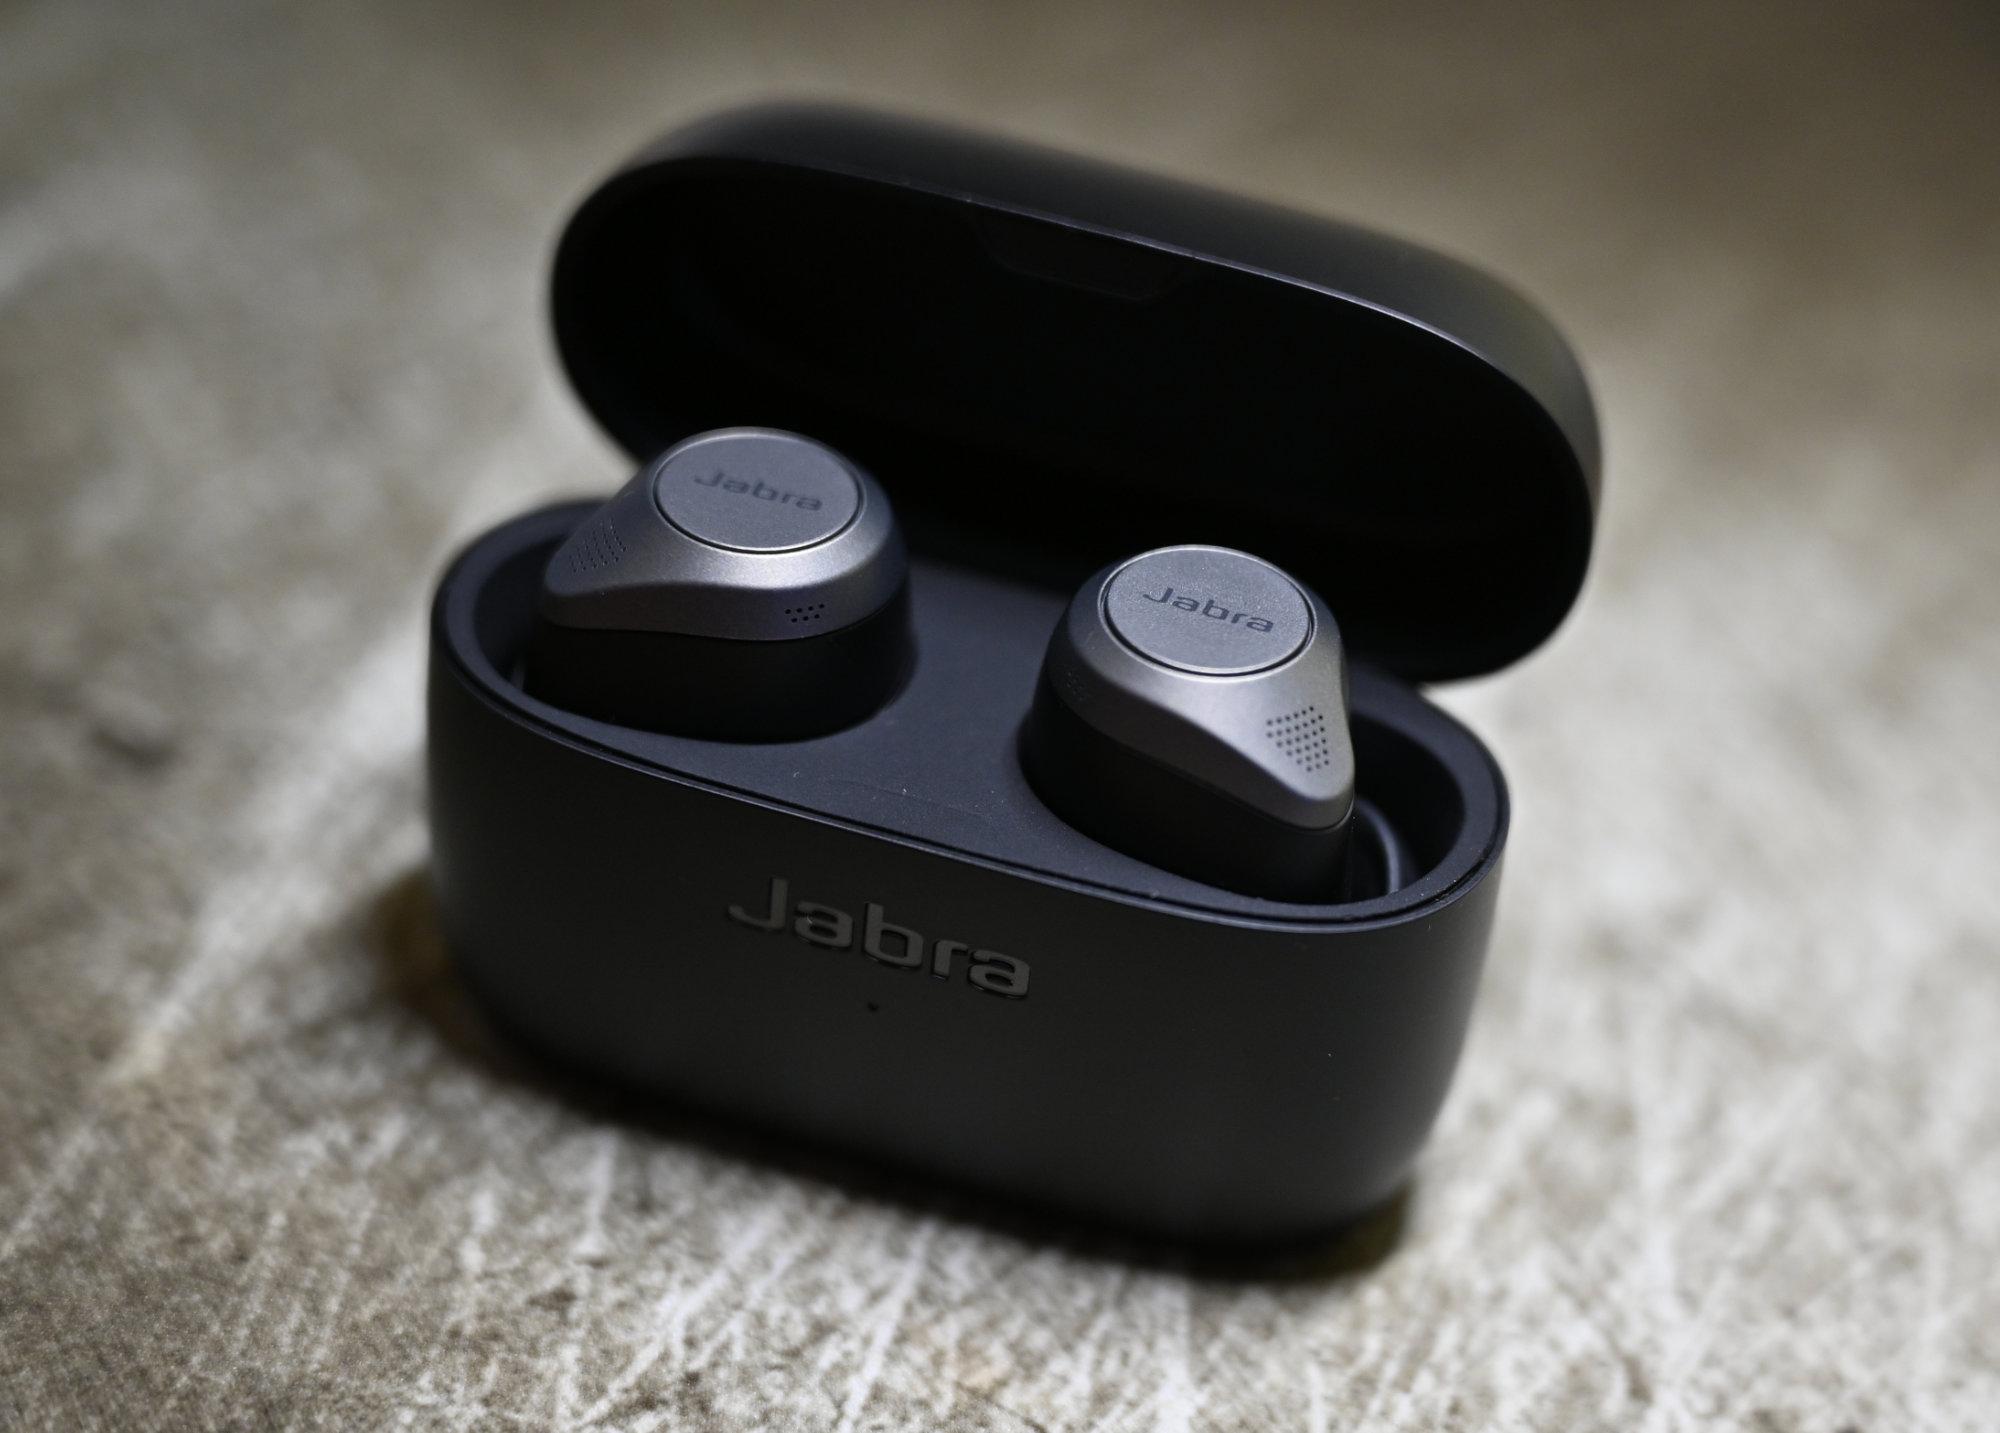 Jabra Elite 85t słuchawki w etui otwarte